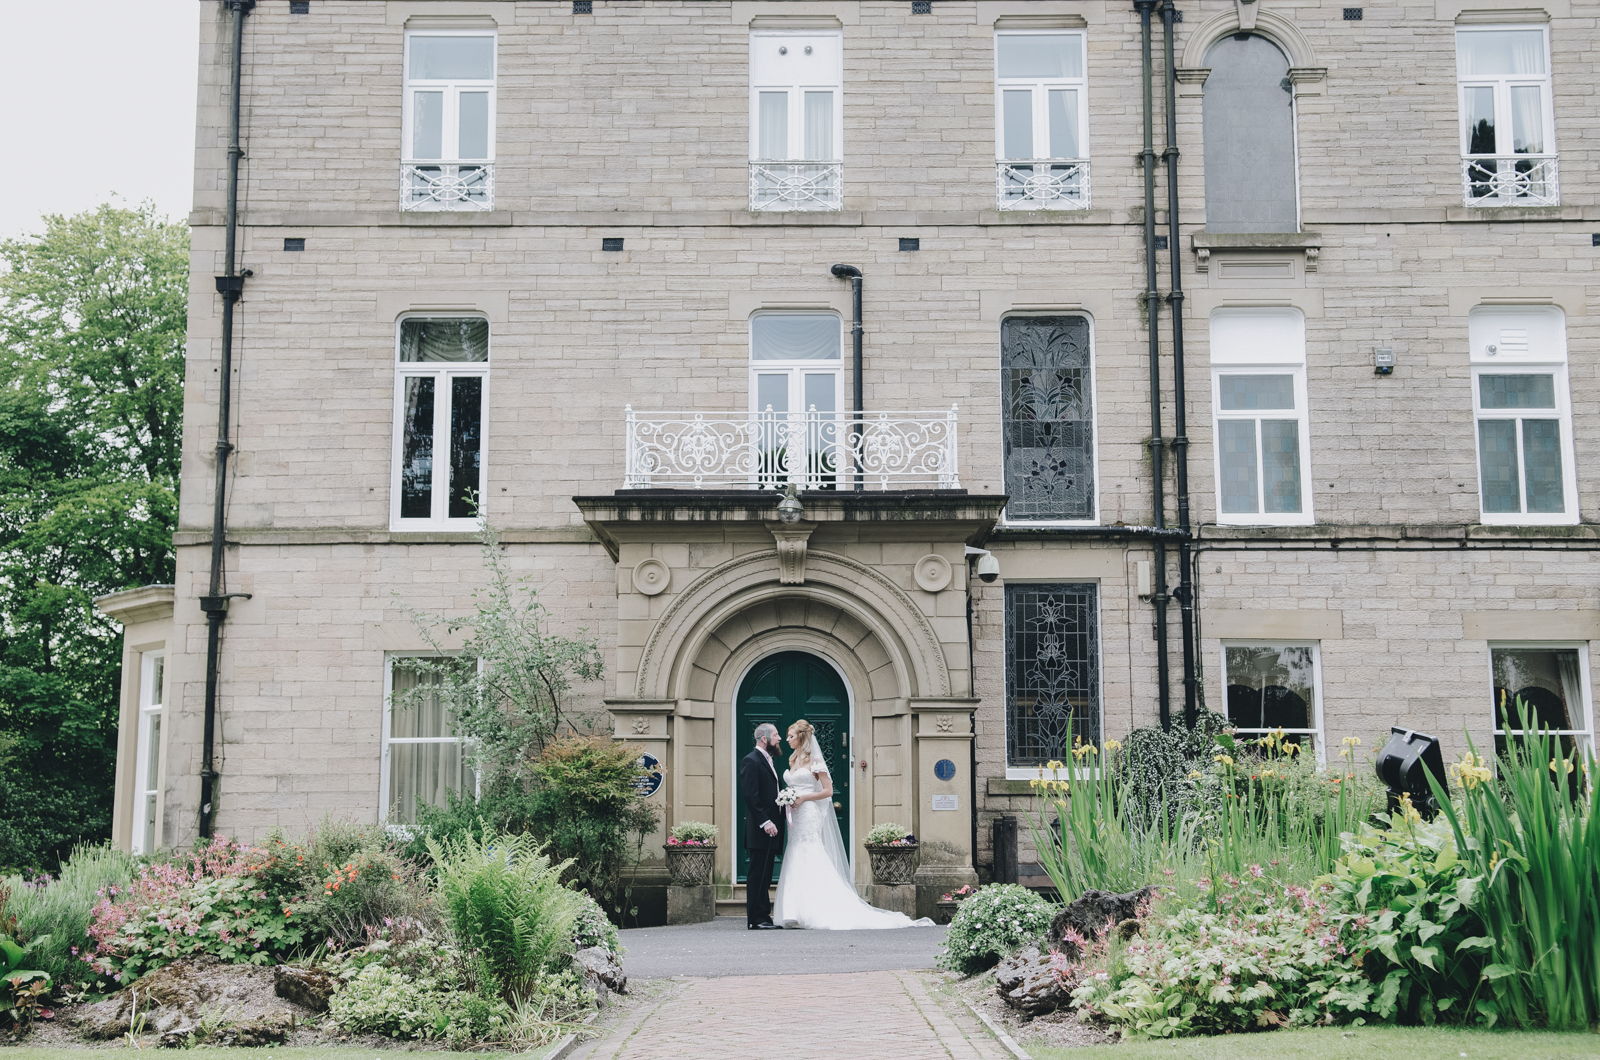 Alternative-North-West-Manchester-Wedding-Photography-Astley-bank-Wedding-skull-cake-tattooed-groom-20.jpg